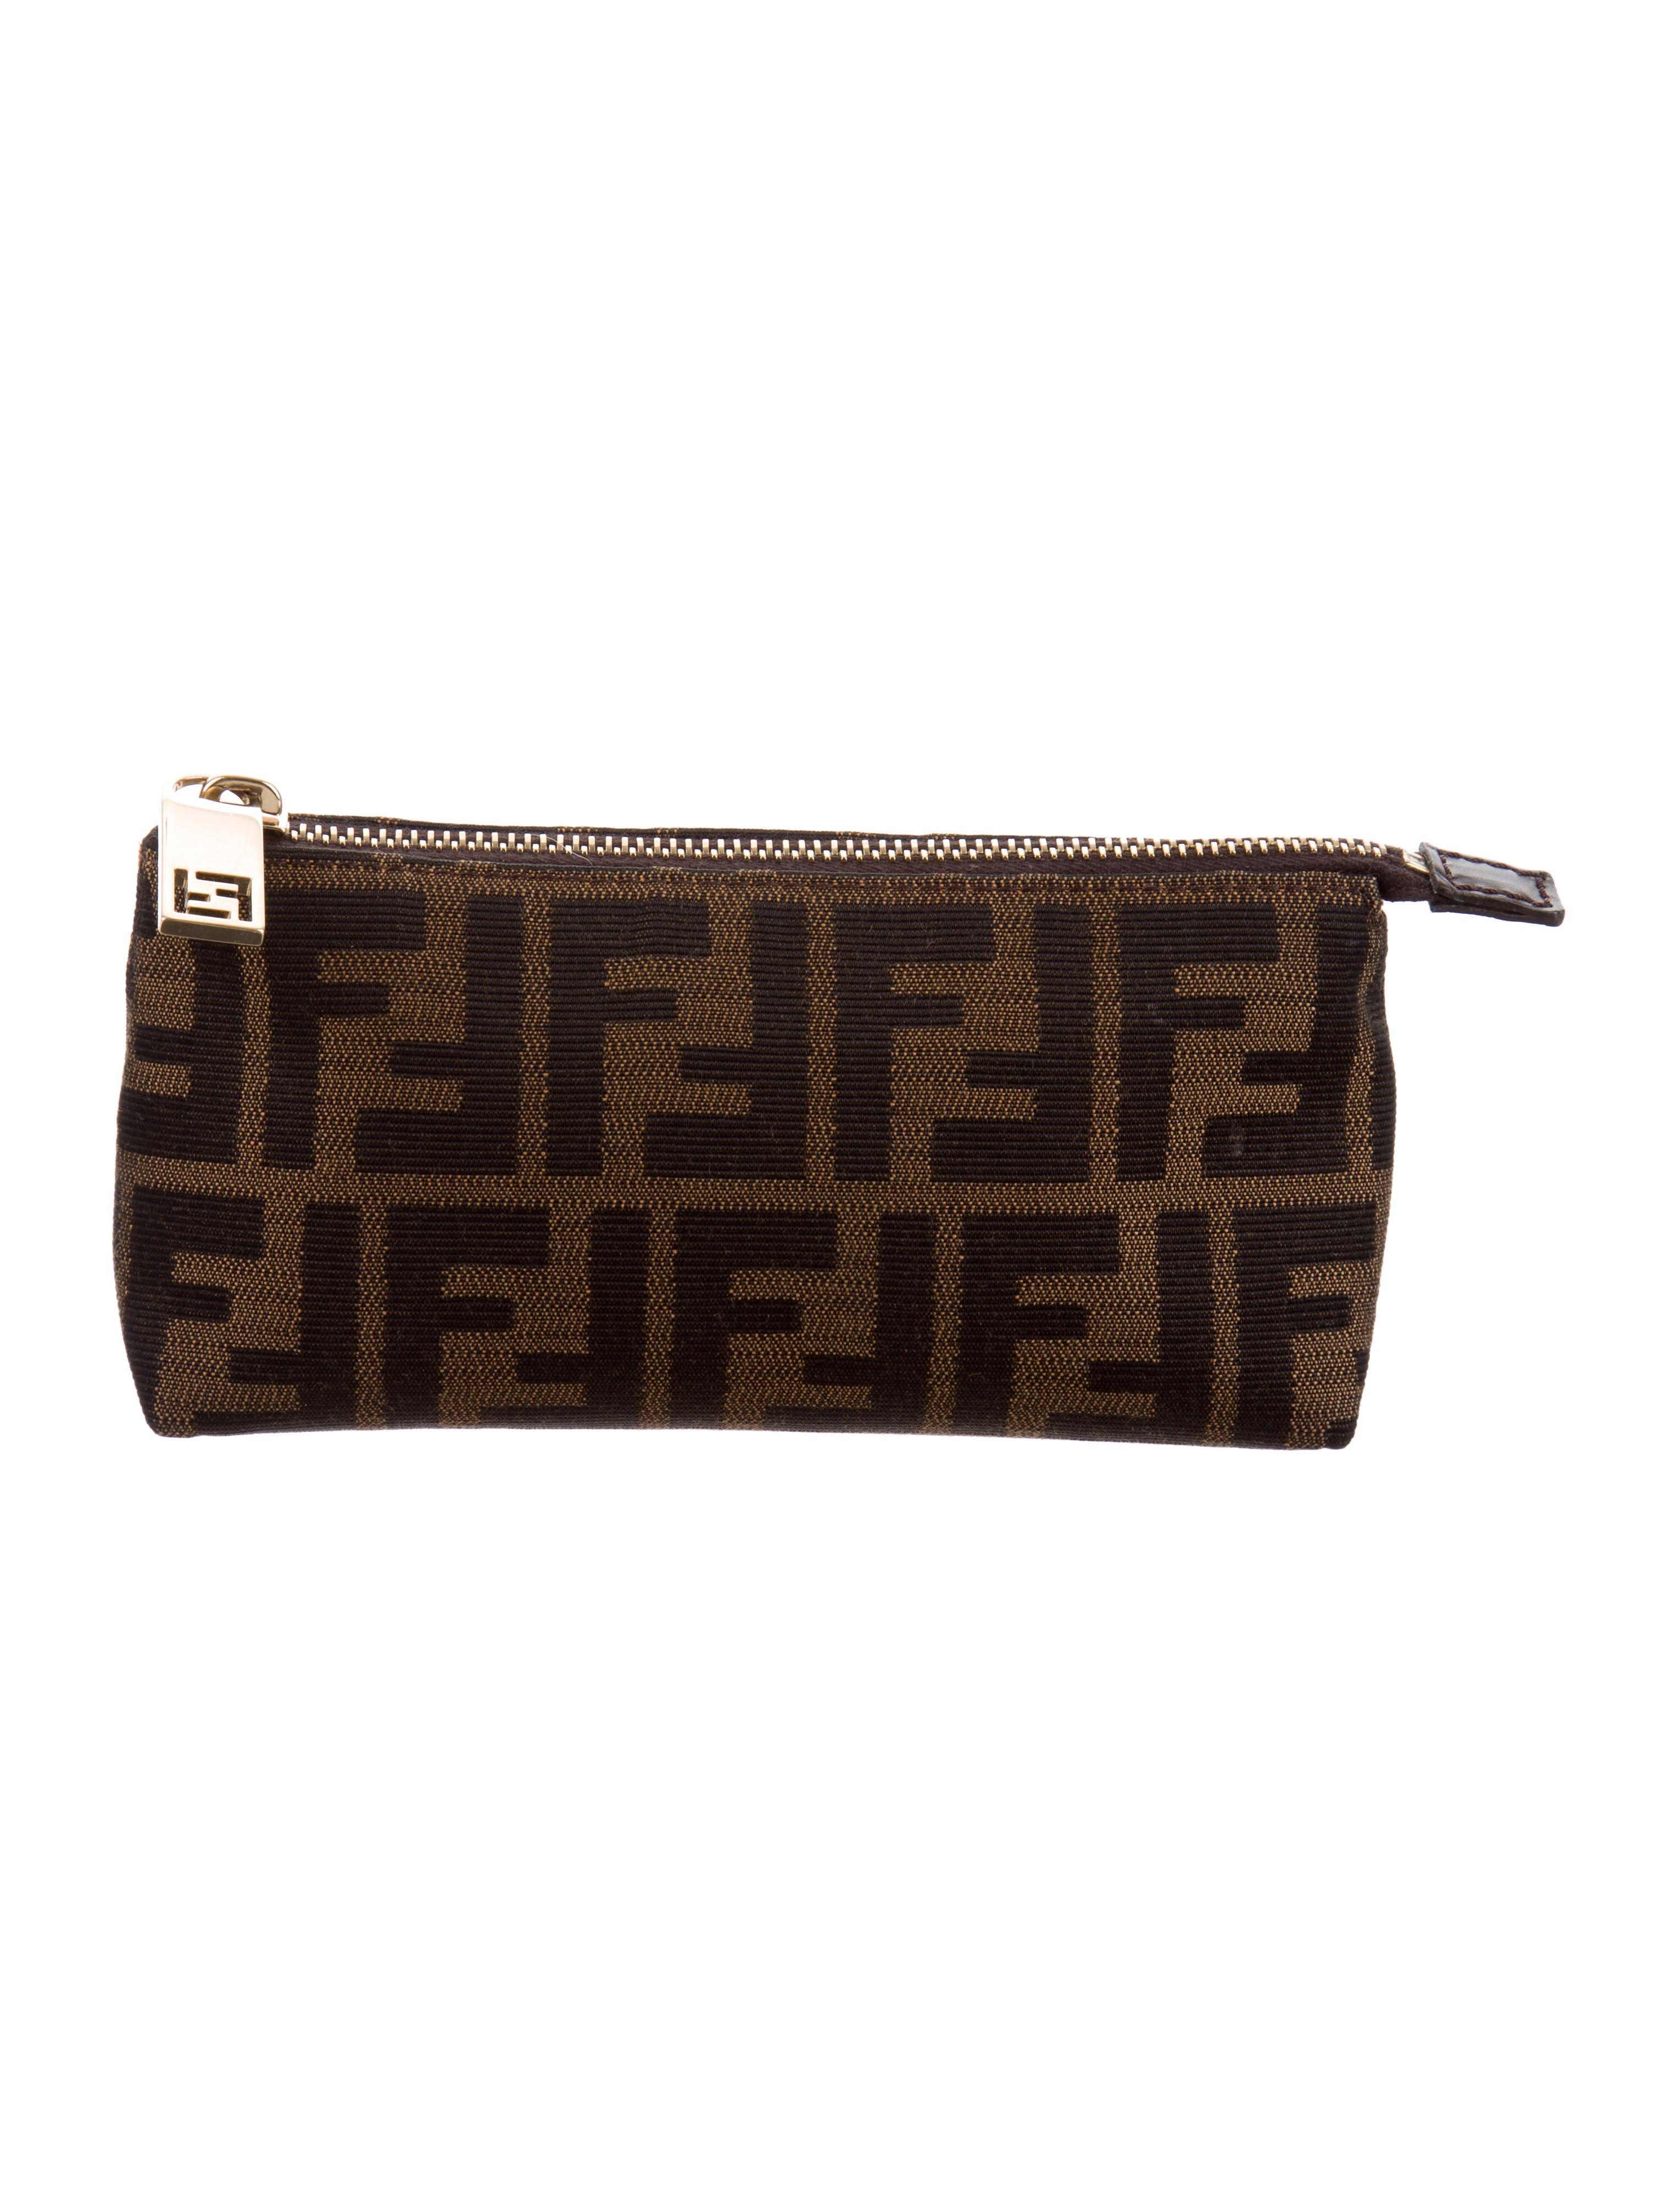 95969d4f2 Fendi Zucca Cosmetic Pouch - Accessories - FEN86222 | The RealReal